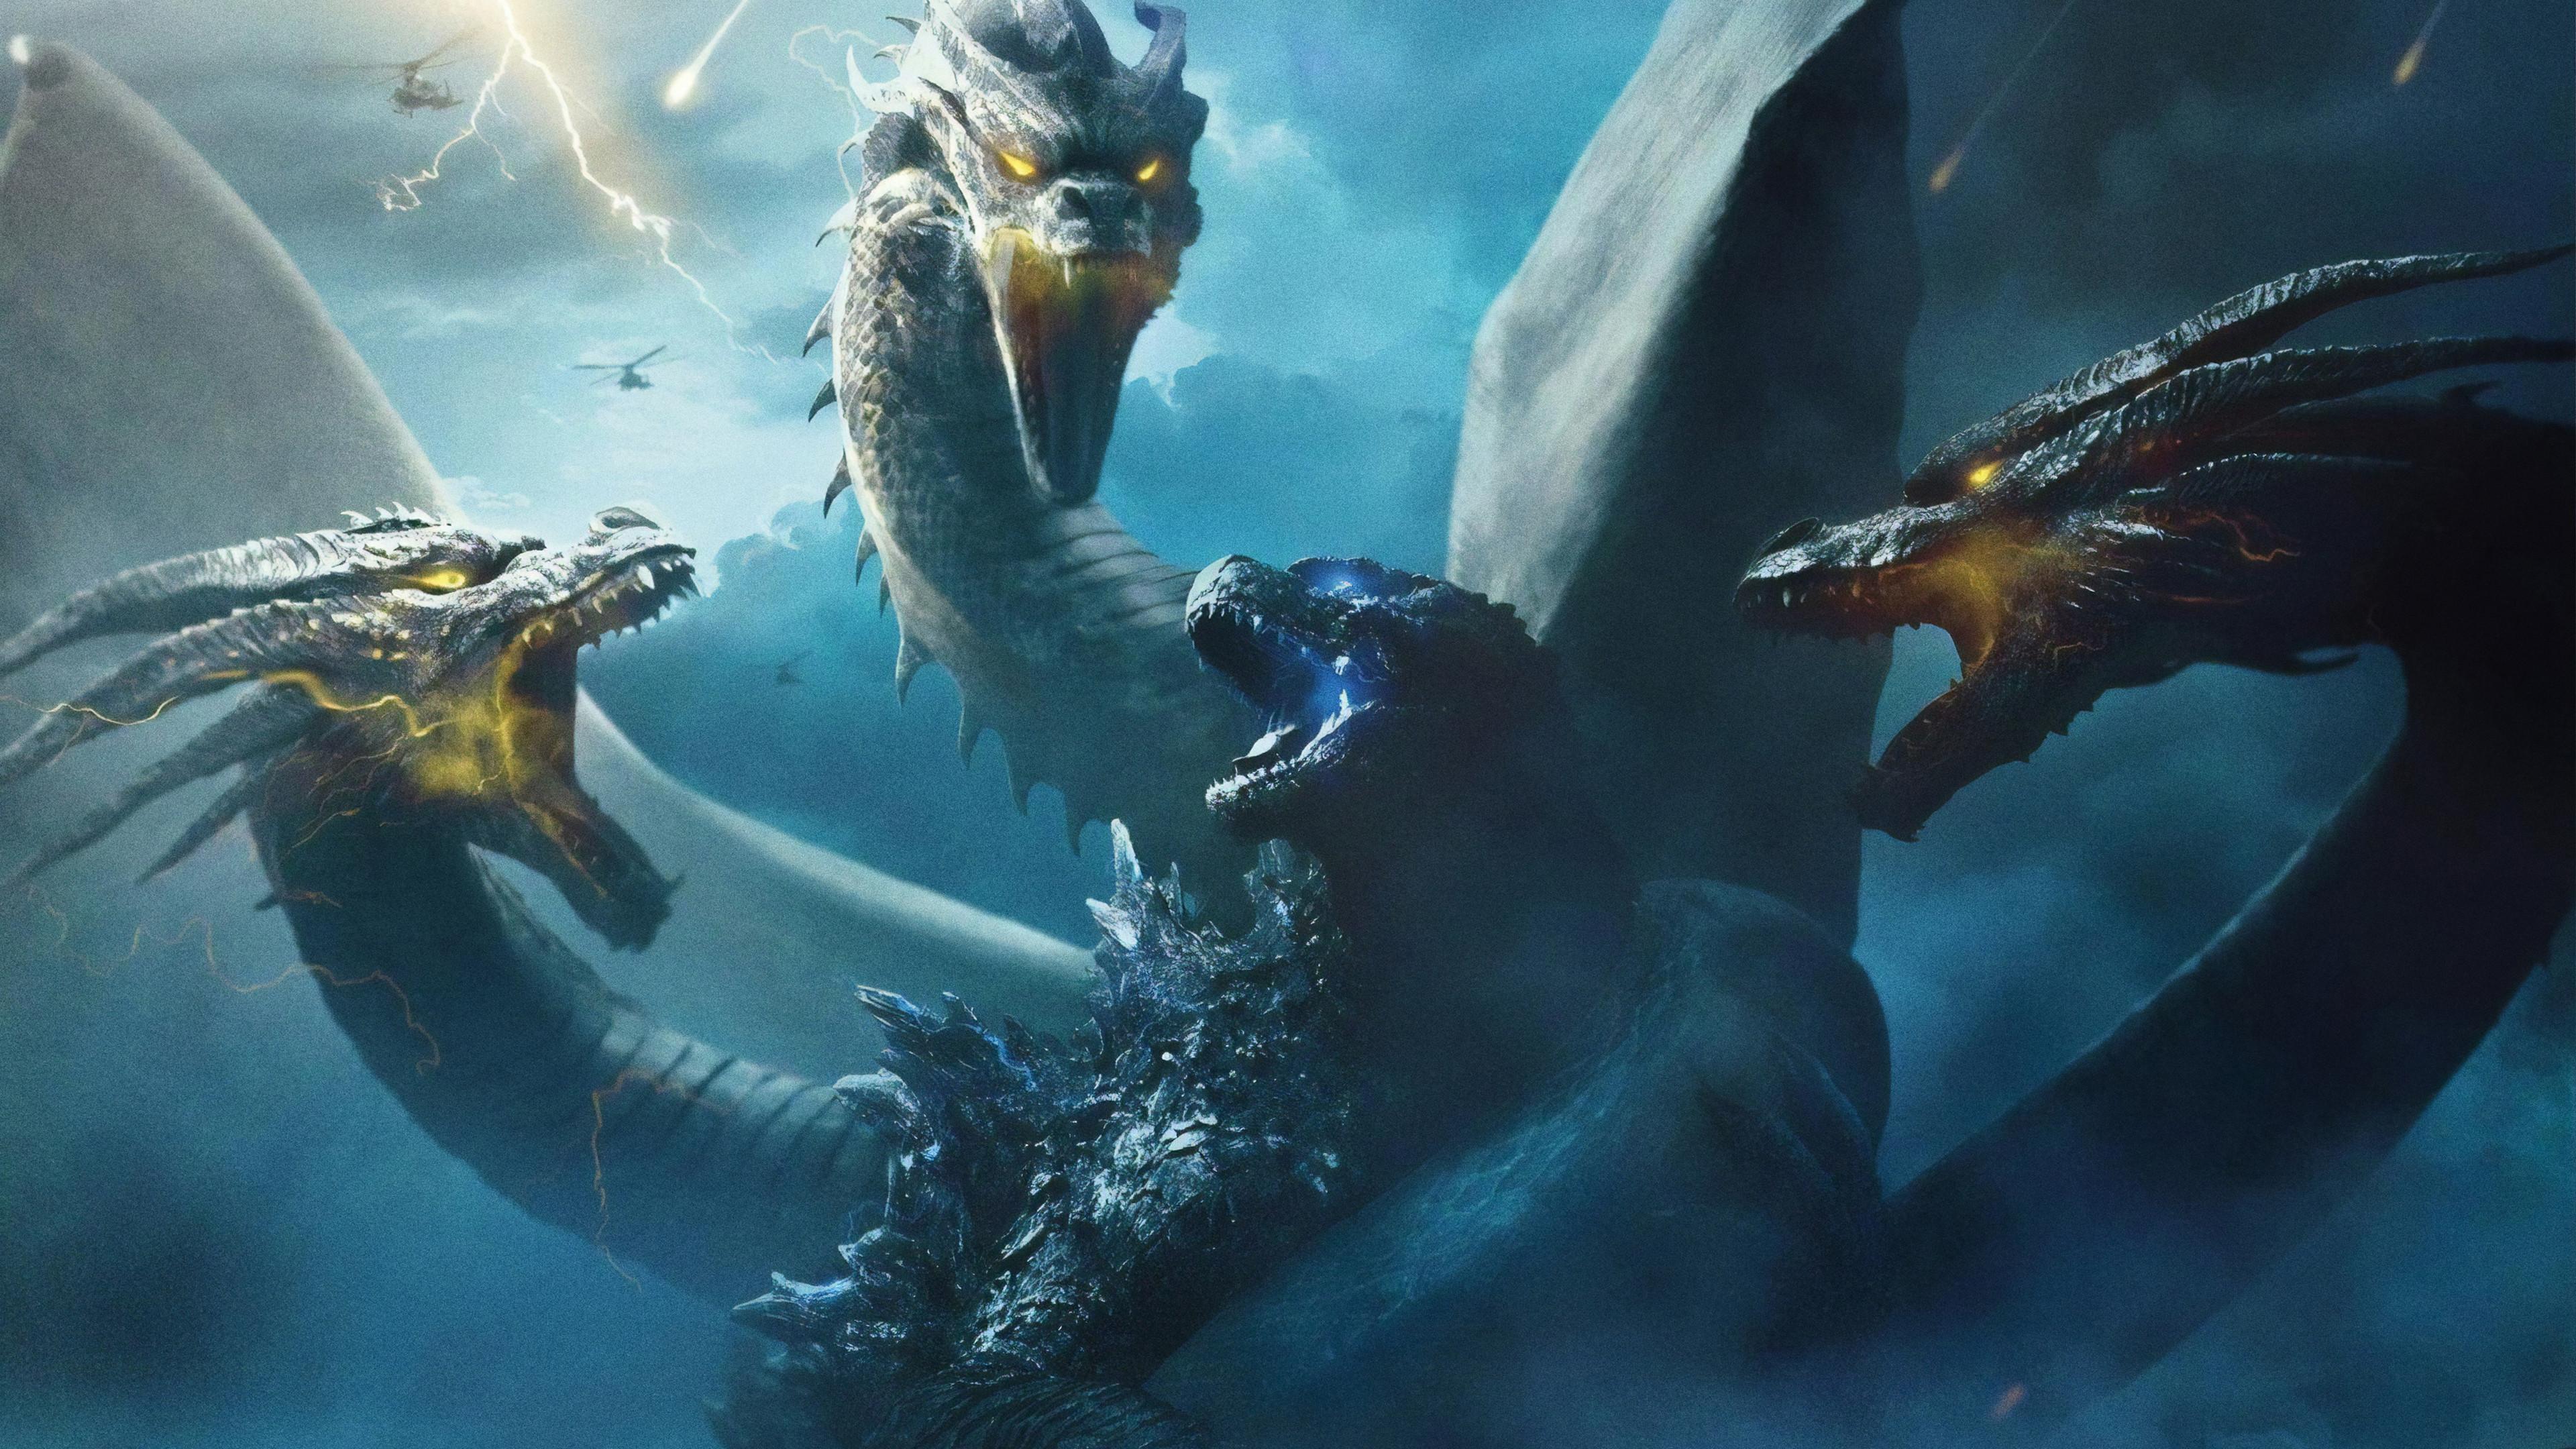 Godzilla Vs King Ghidorah King Of The Monsters 4k Wallpaper 15